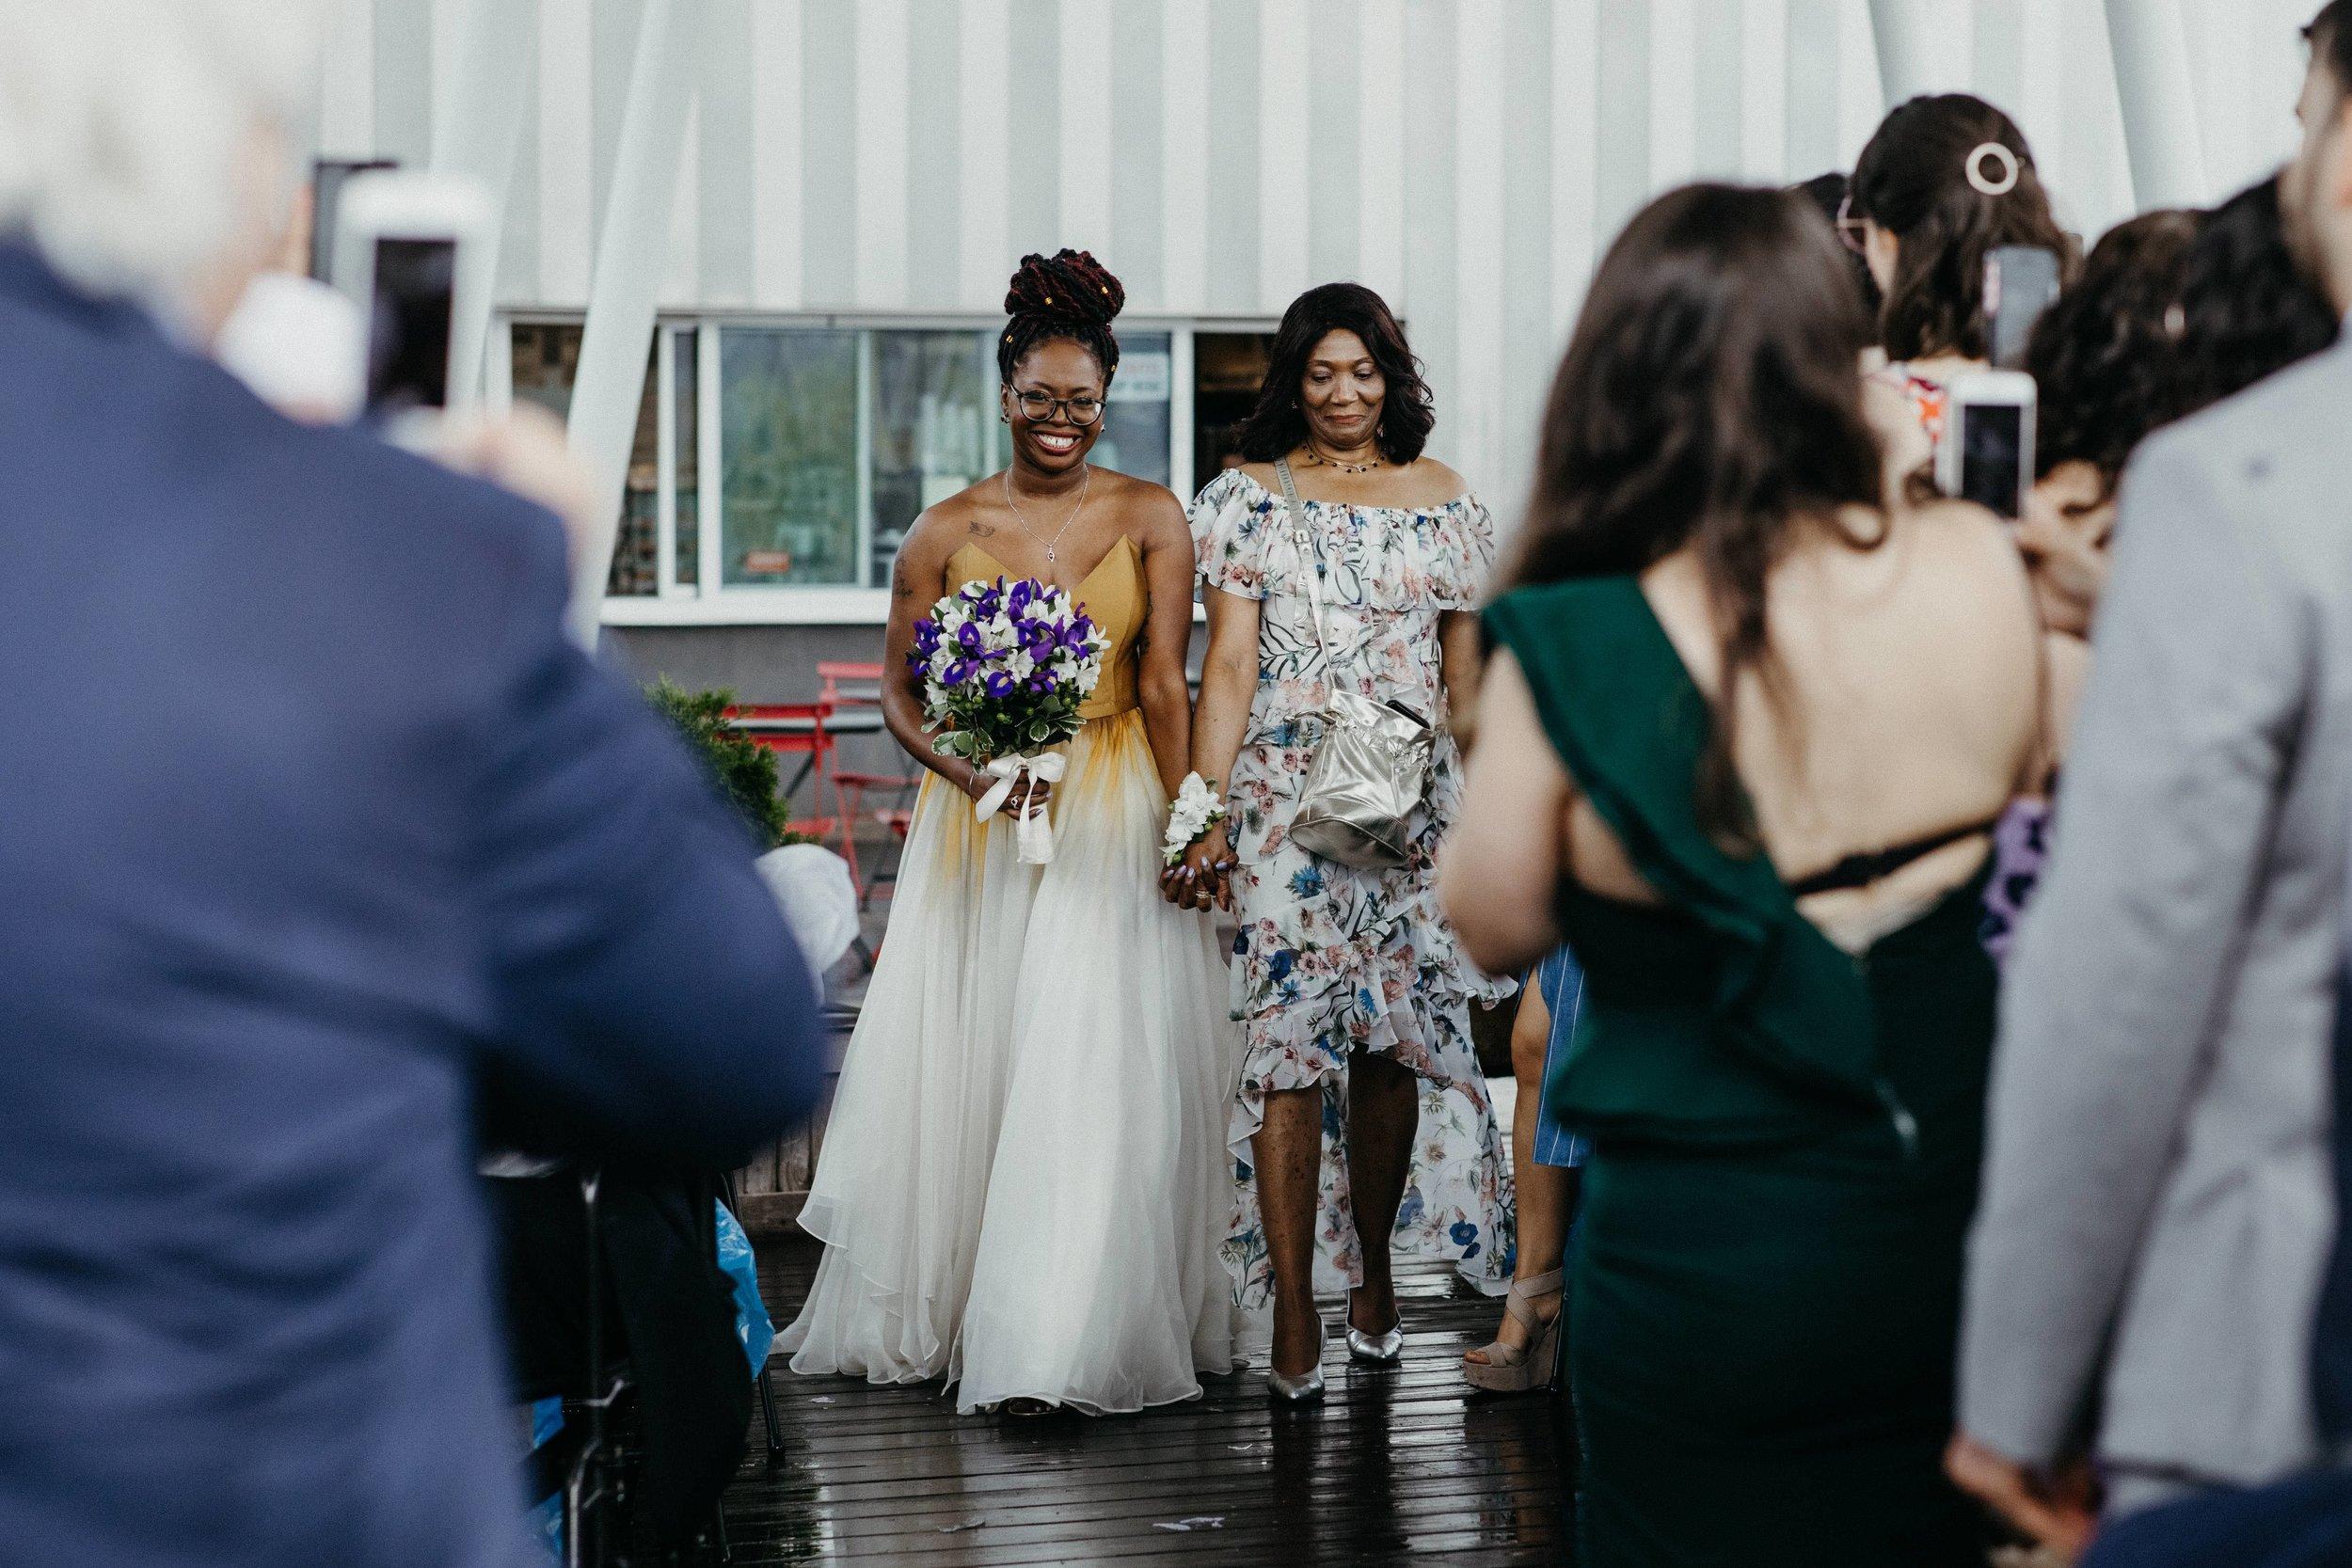 Sevlynn-Photography-Wedding-LIC-Landing-Maiella-NYC-39.jpg